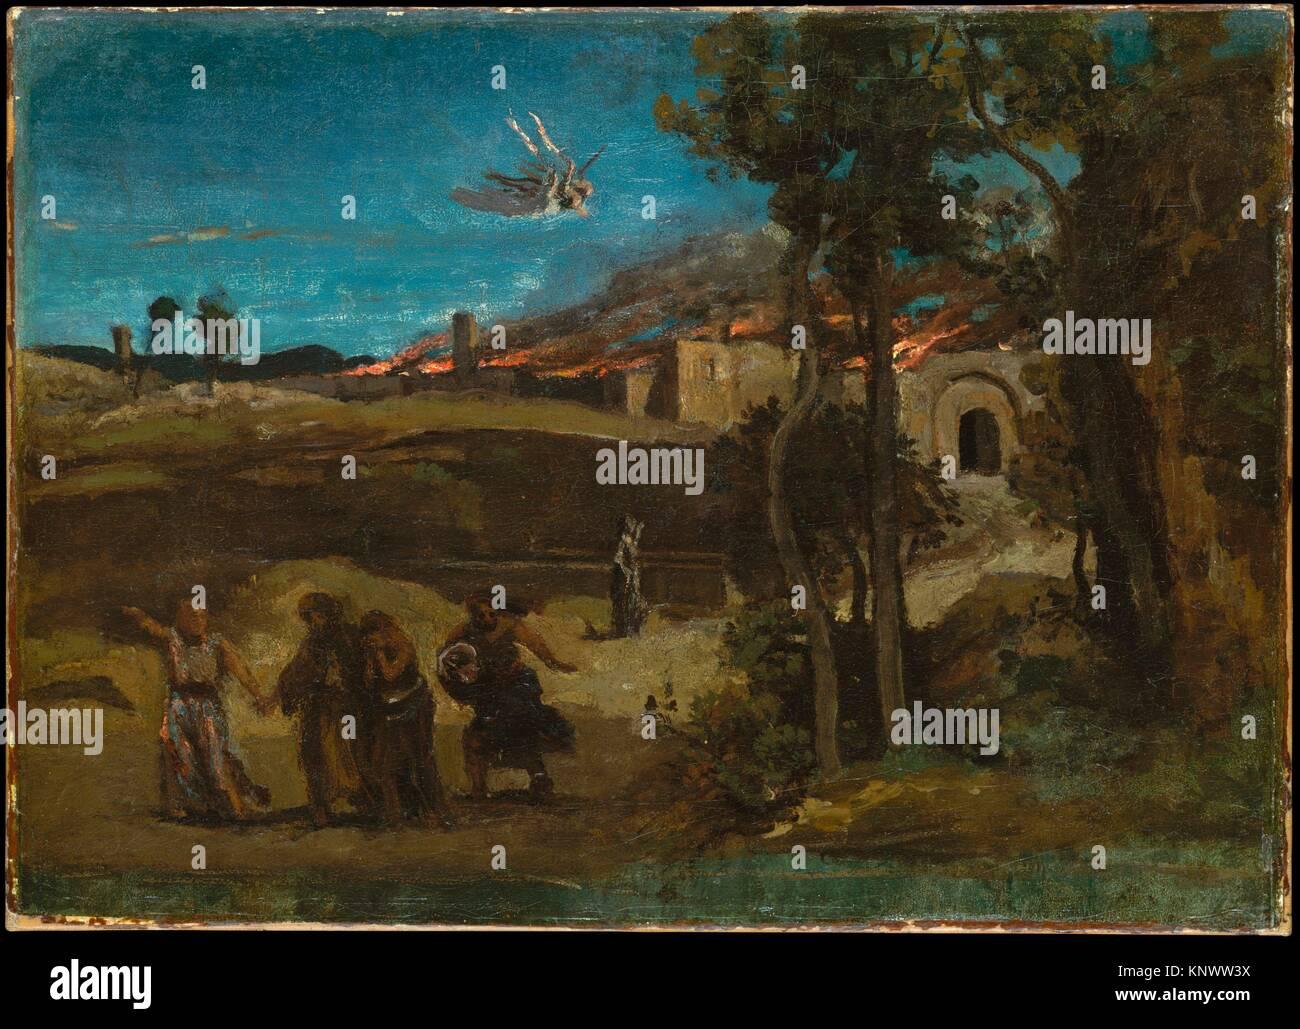 Study for The Destruction of Sodom. Artist: Camille Corot (French, Paris 1796-1875 Paris); Date: 1843; Medium: Oil Stock Photo